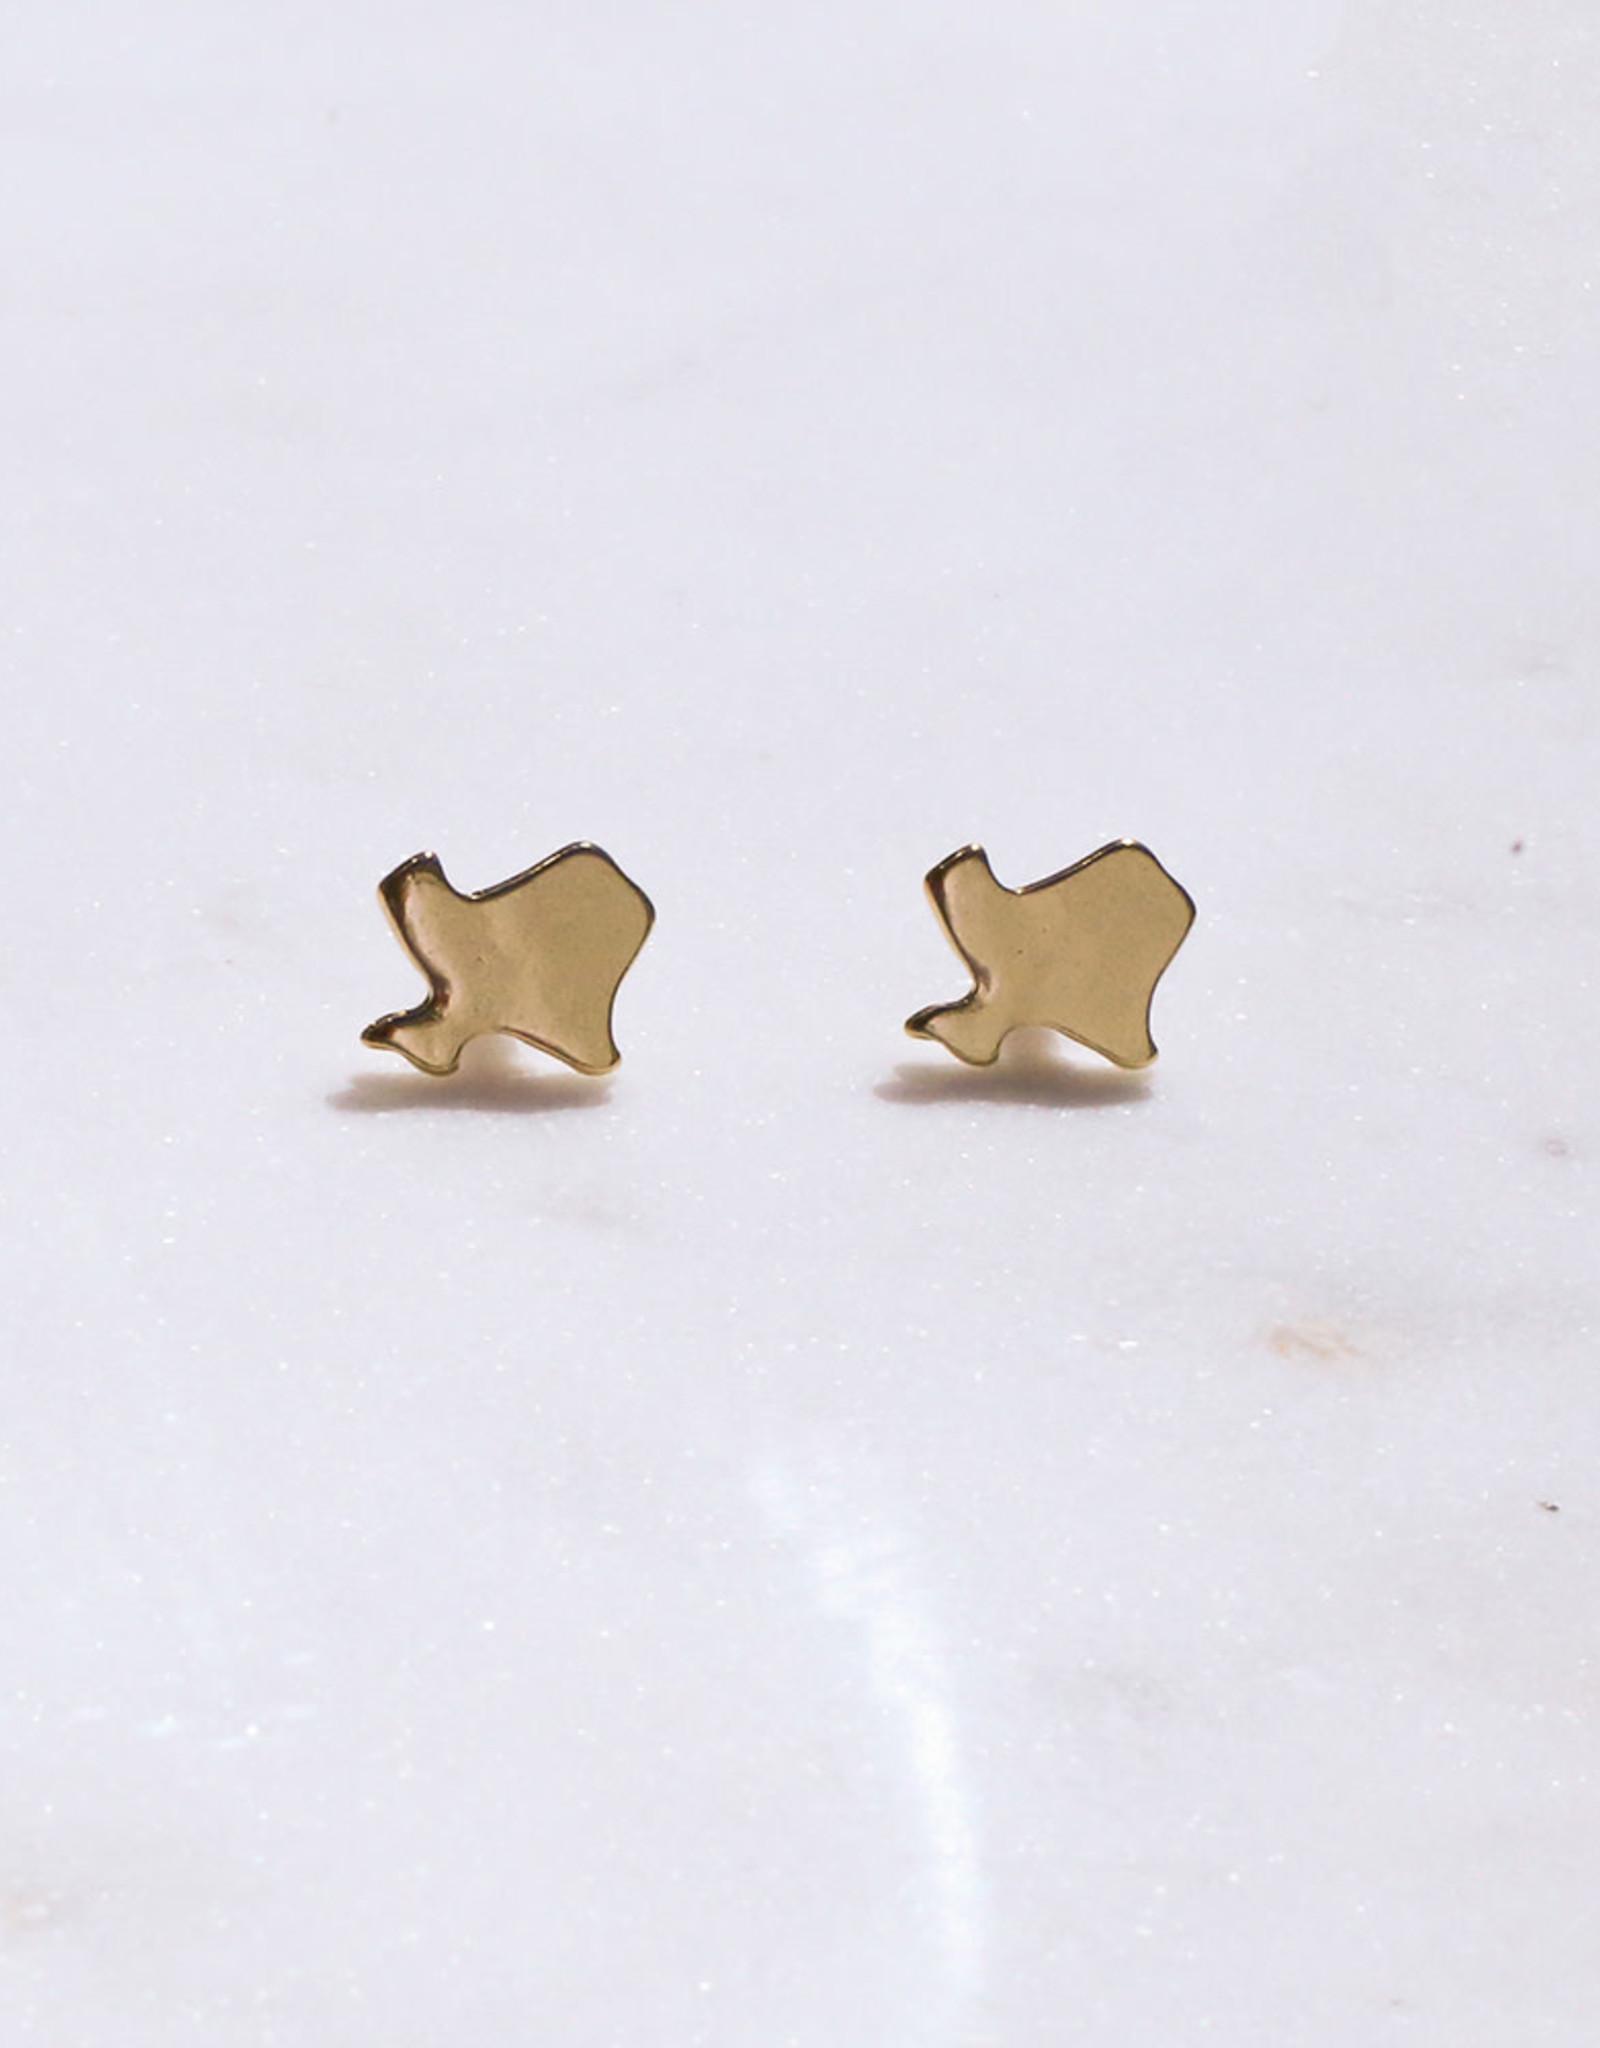 Wink RS Gold Texas Stud Earrings